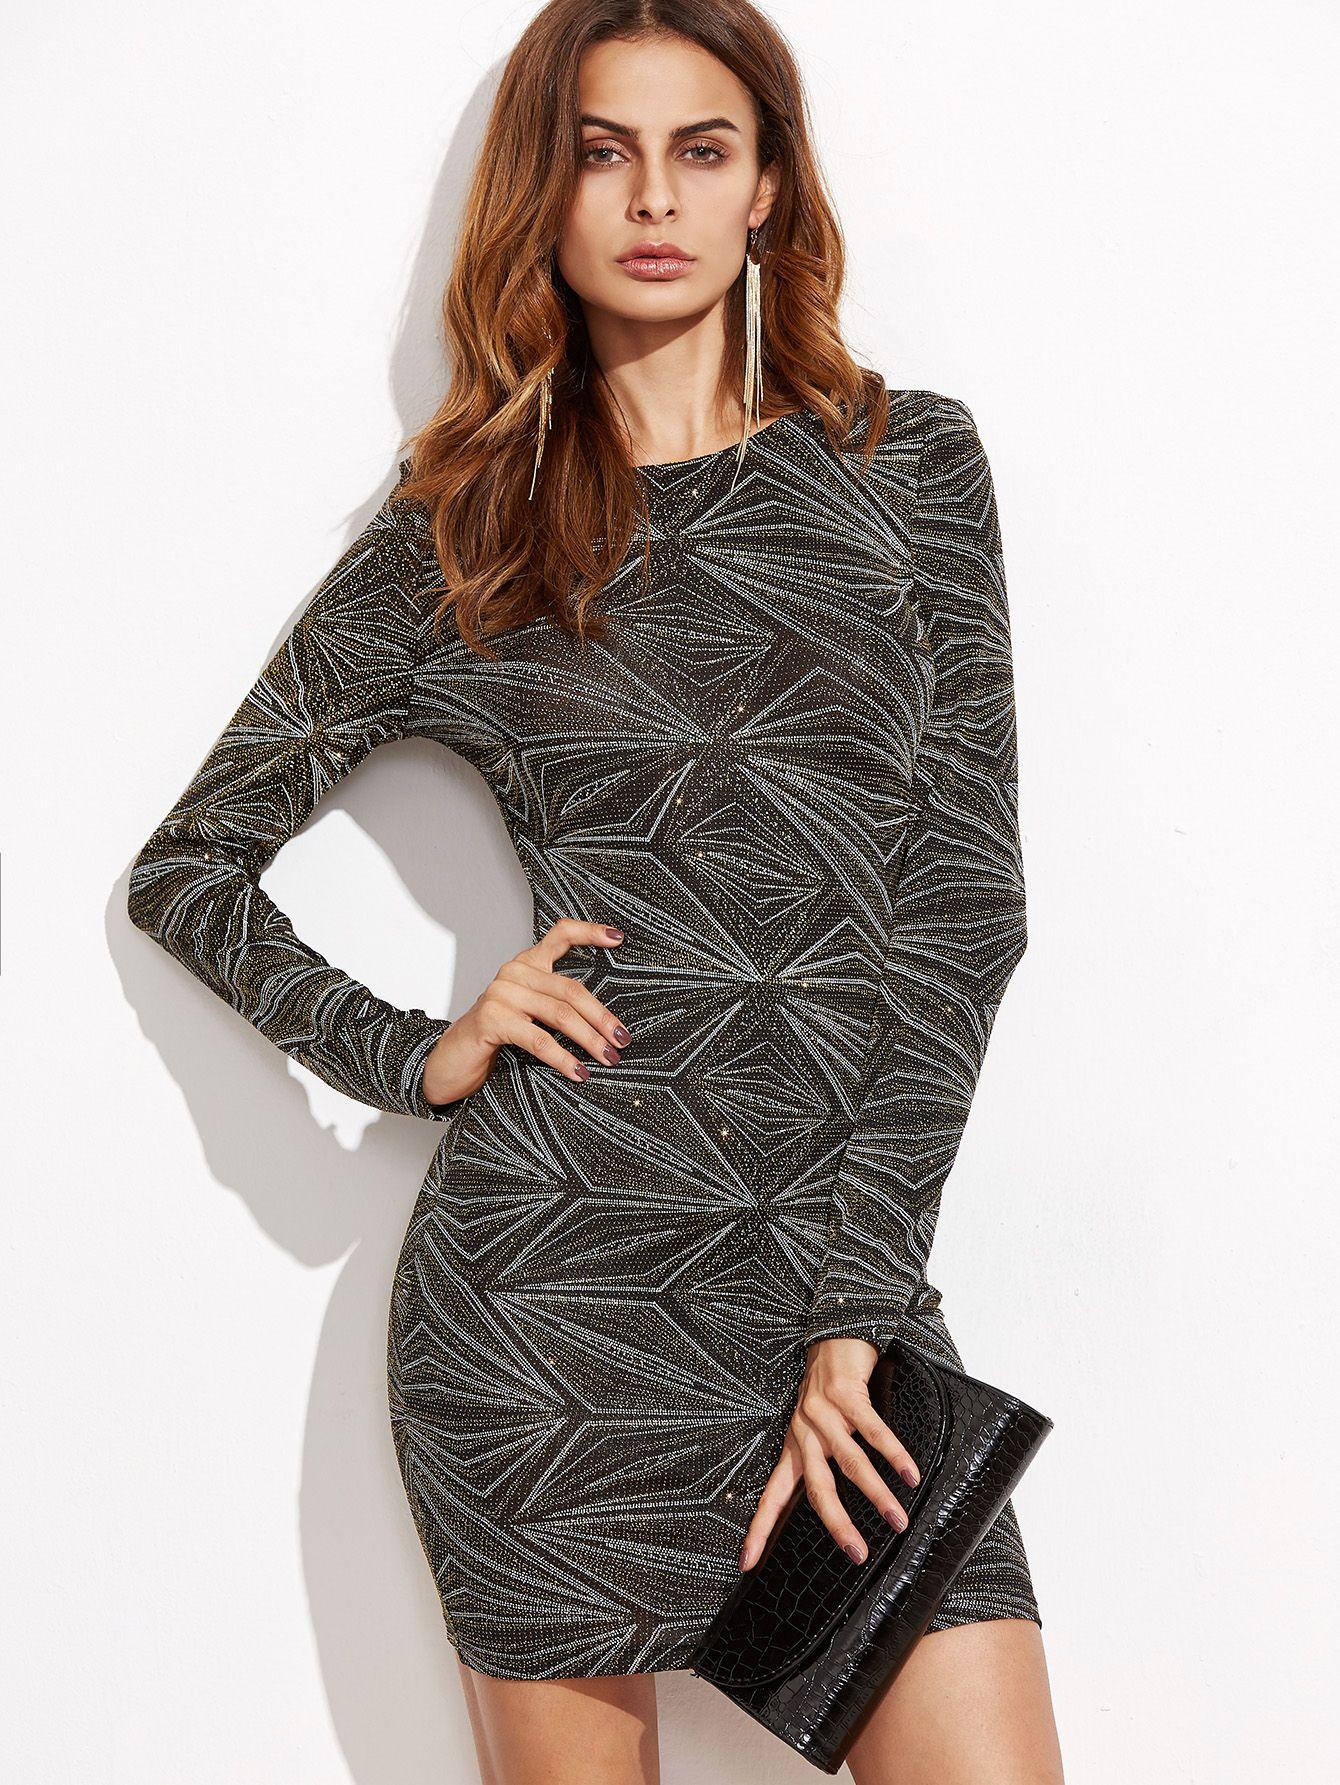 75af4a3a473 Black+Geo+Pattern+Sparkle+Bodycon+Dress+23.00